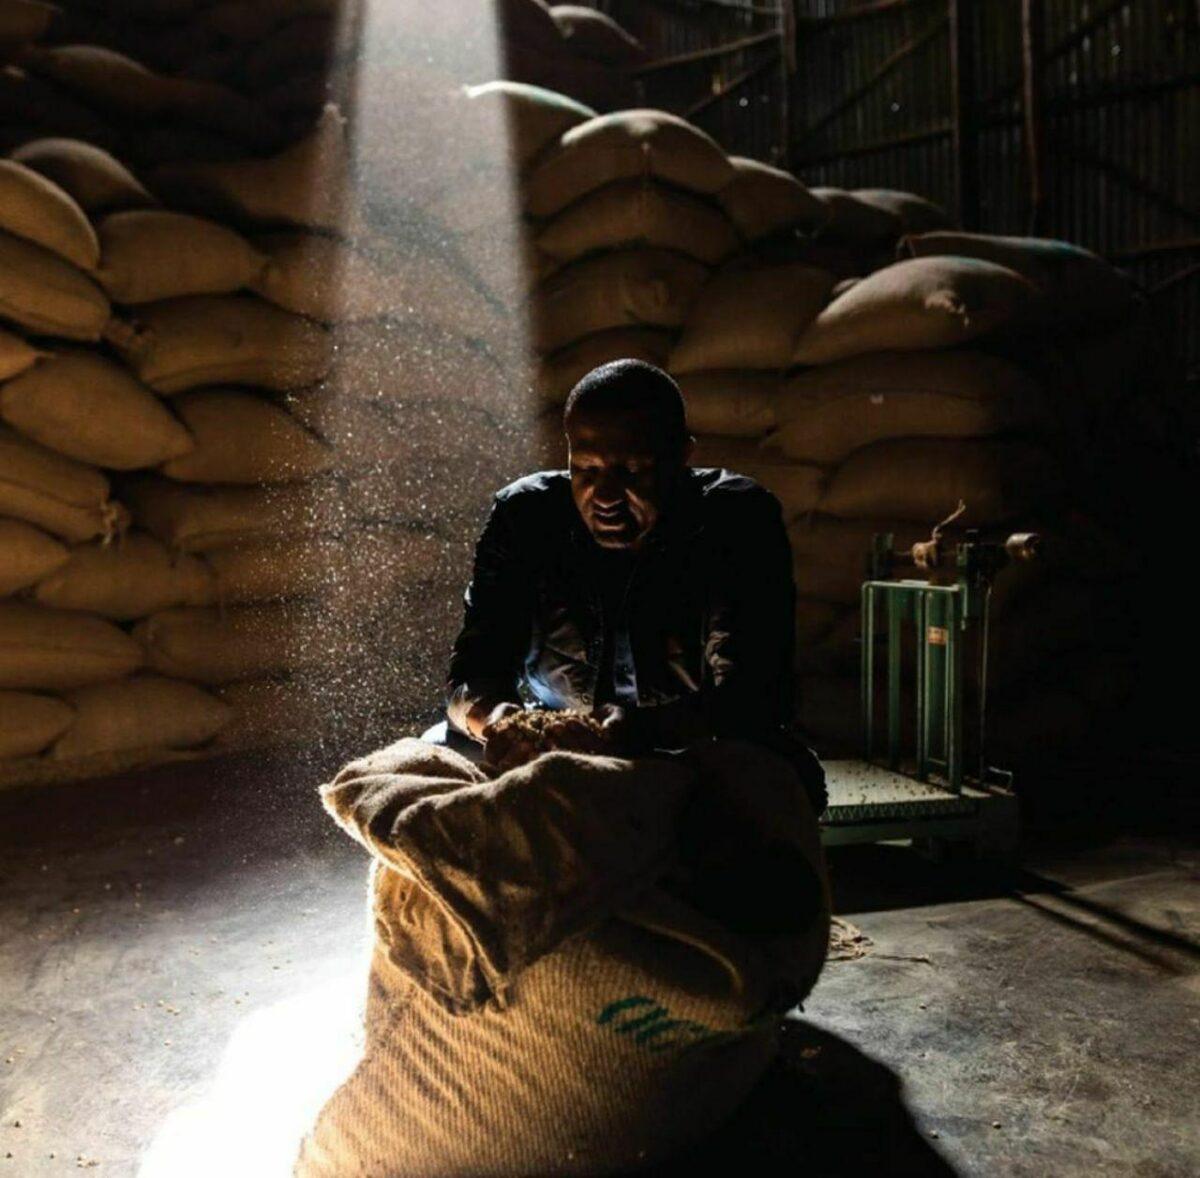 رست صنعتی قهوه